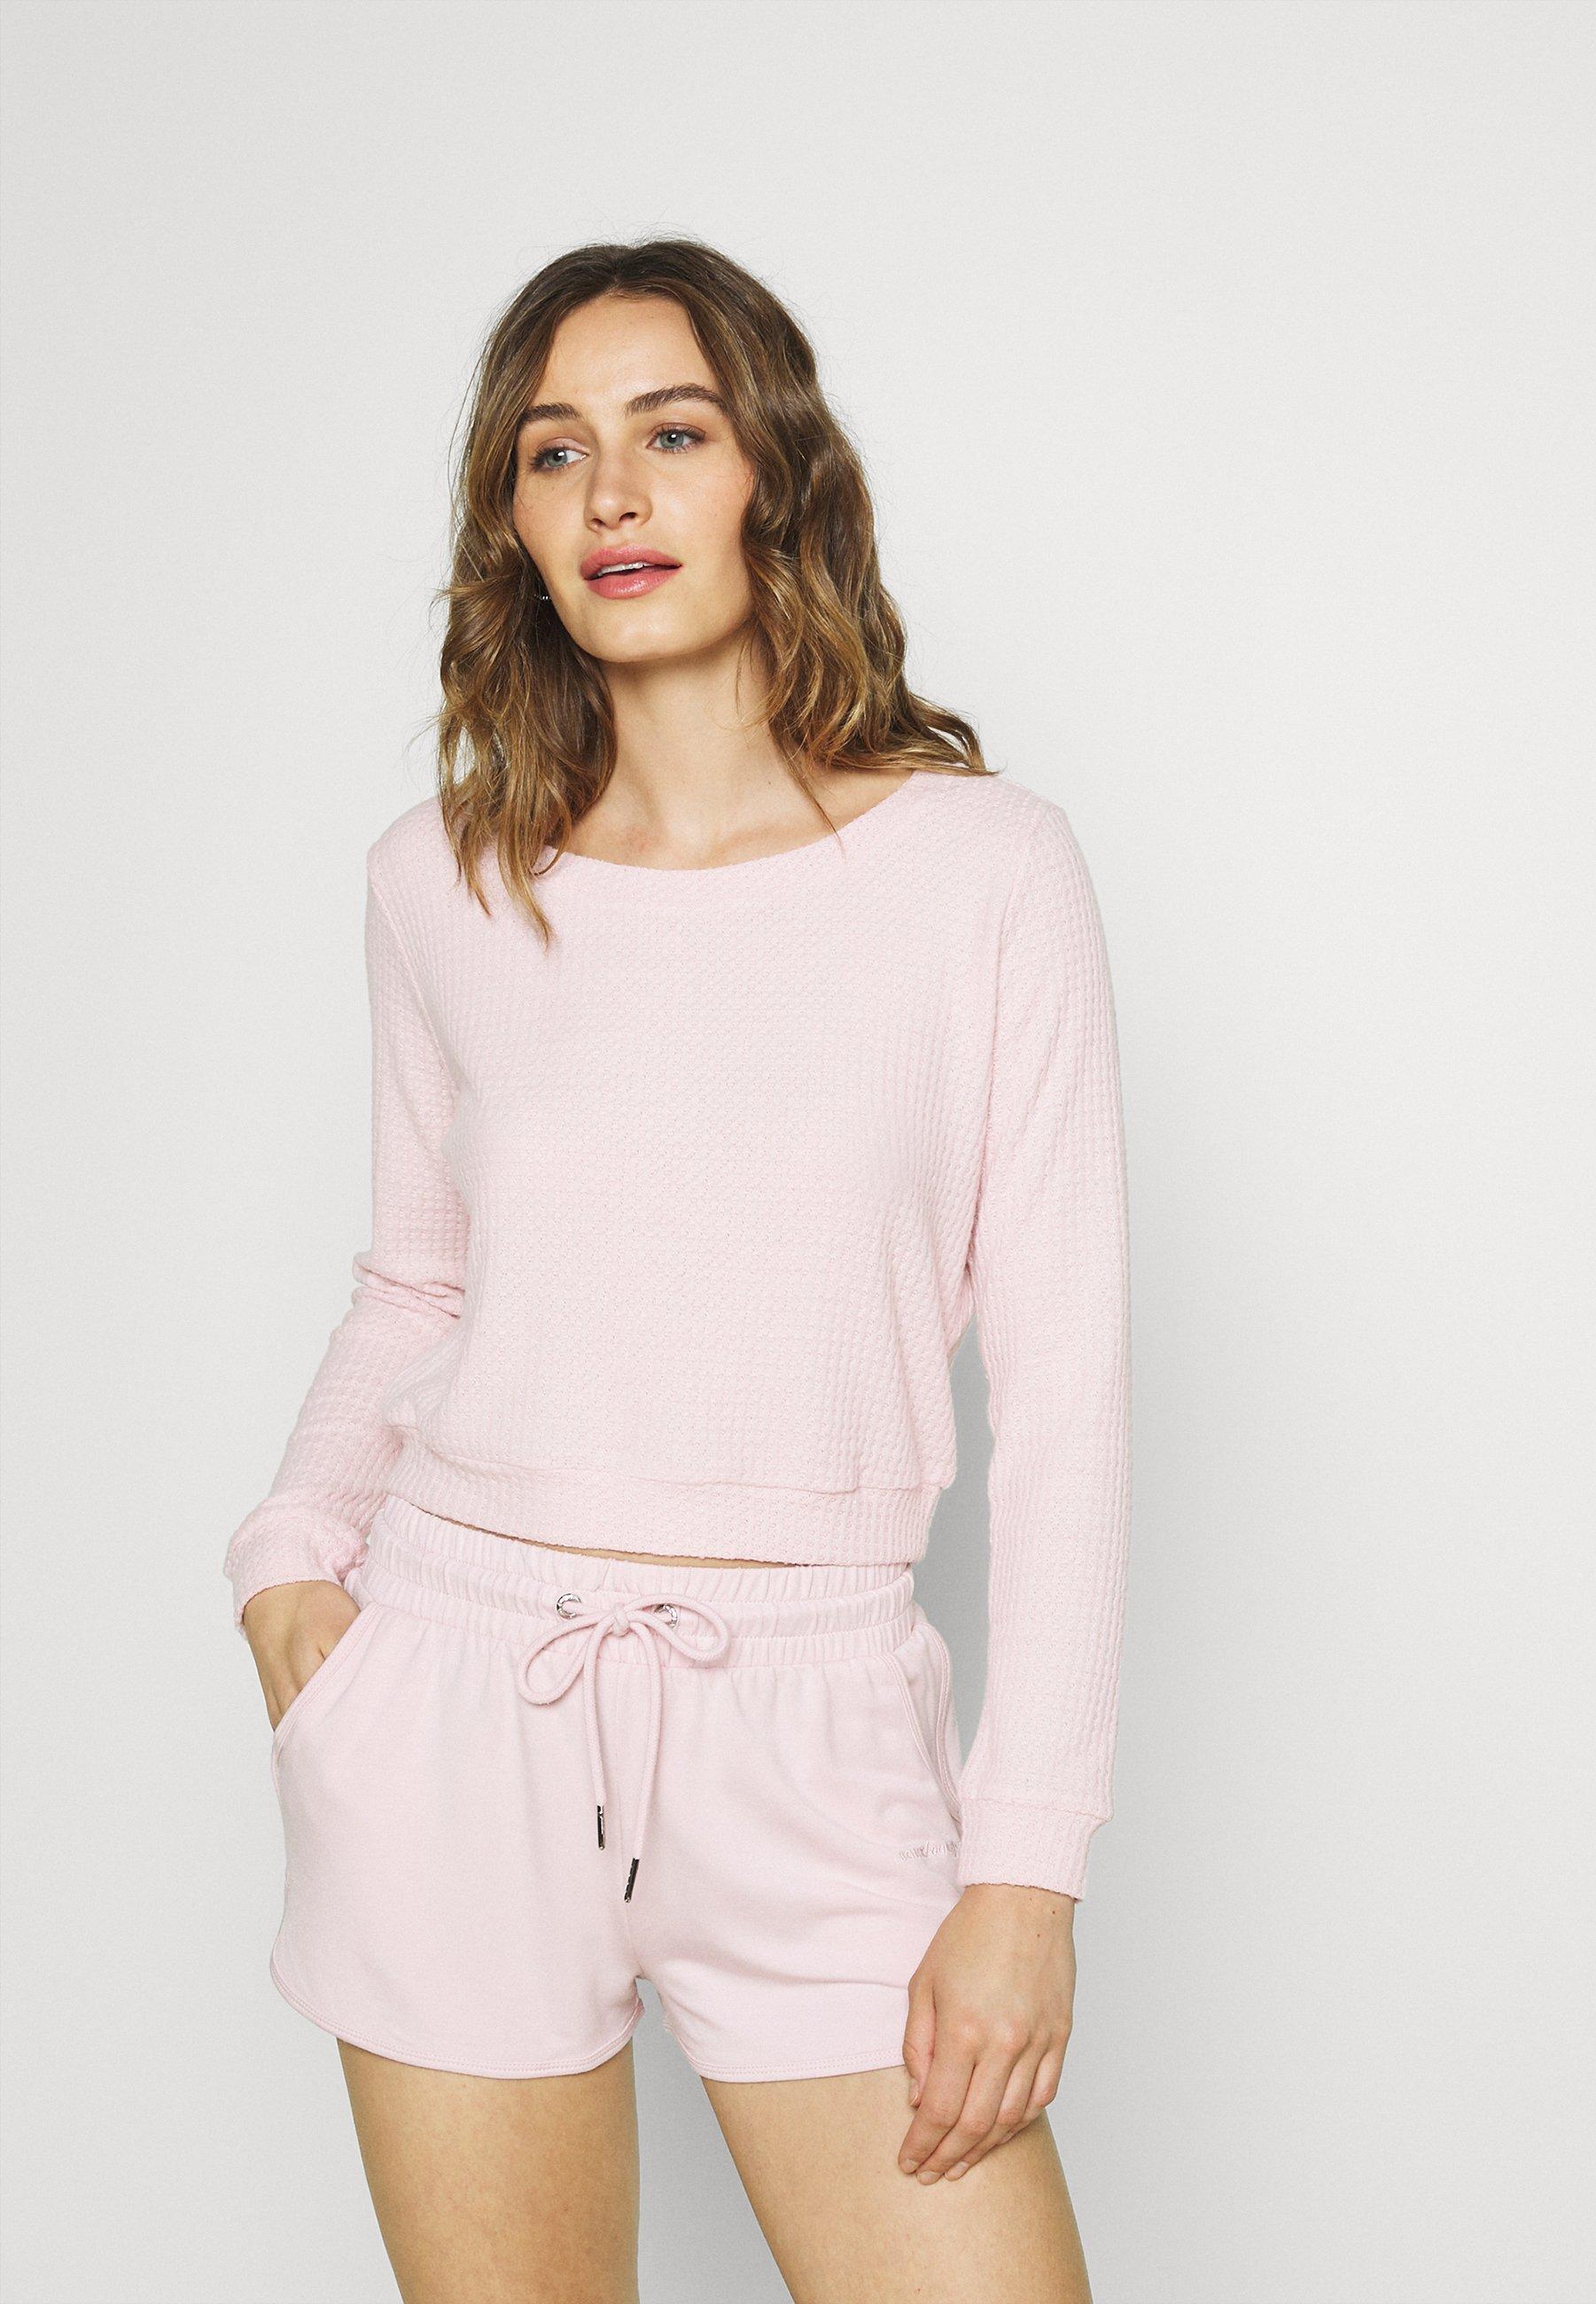 Damen WAFFLE - Nachtwäsche Shirt